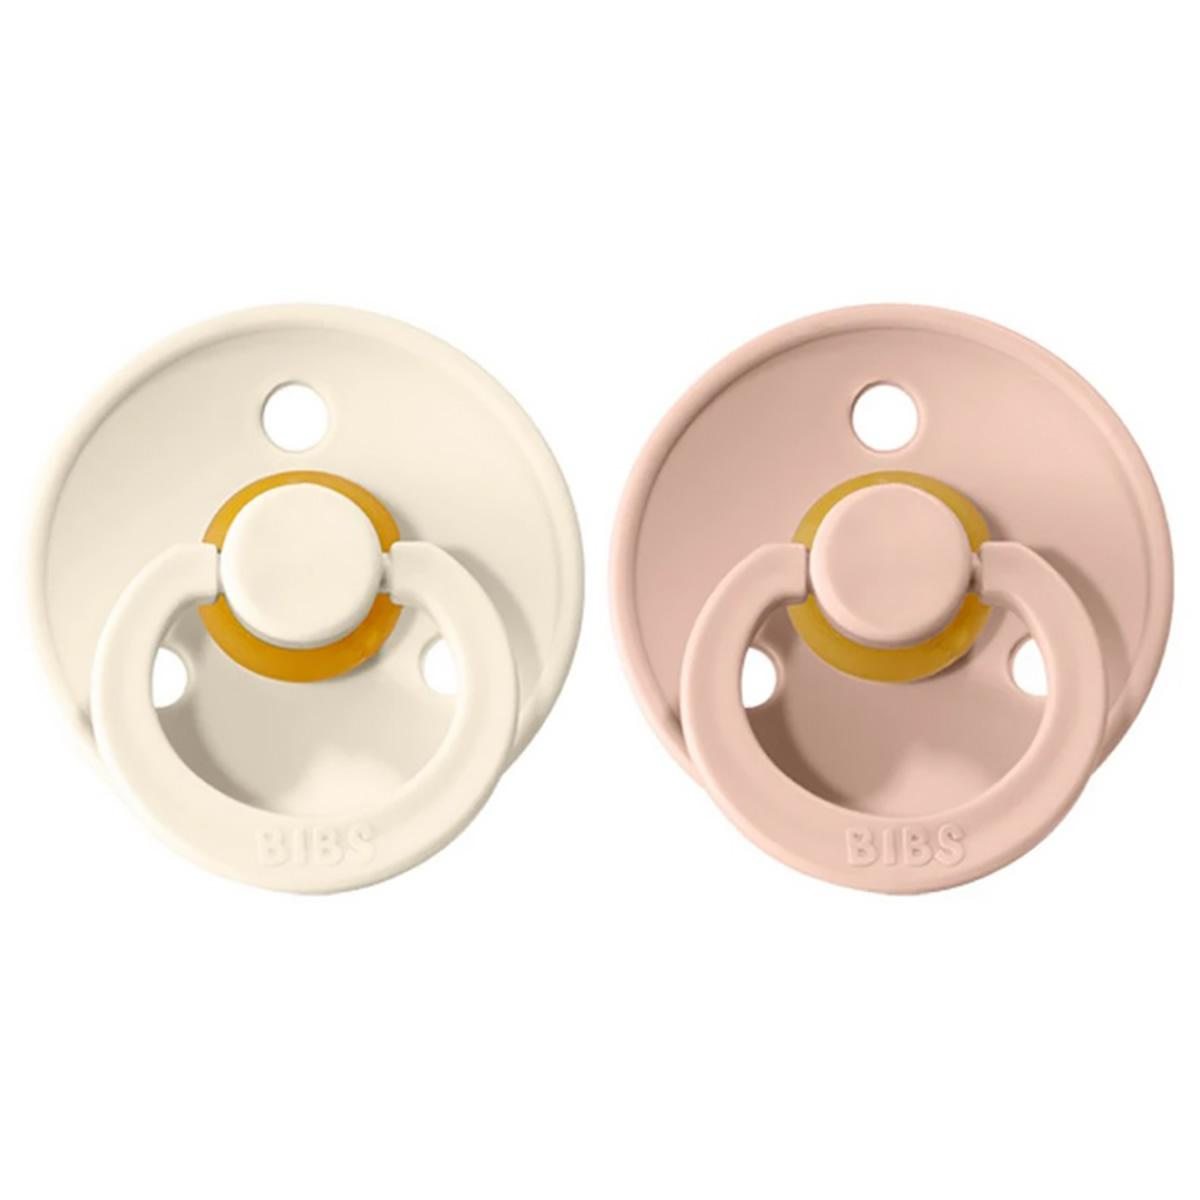 2 Chupetes BIBS Colours Blush/Ivory